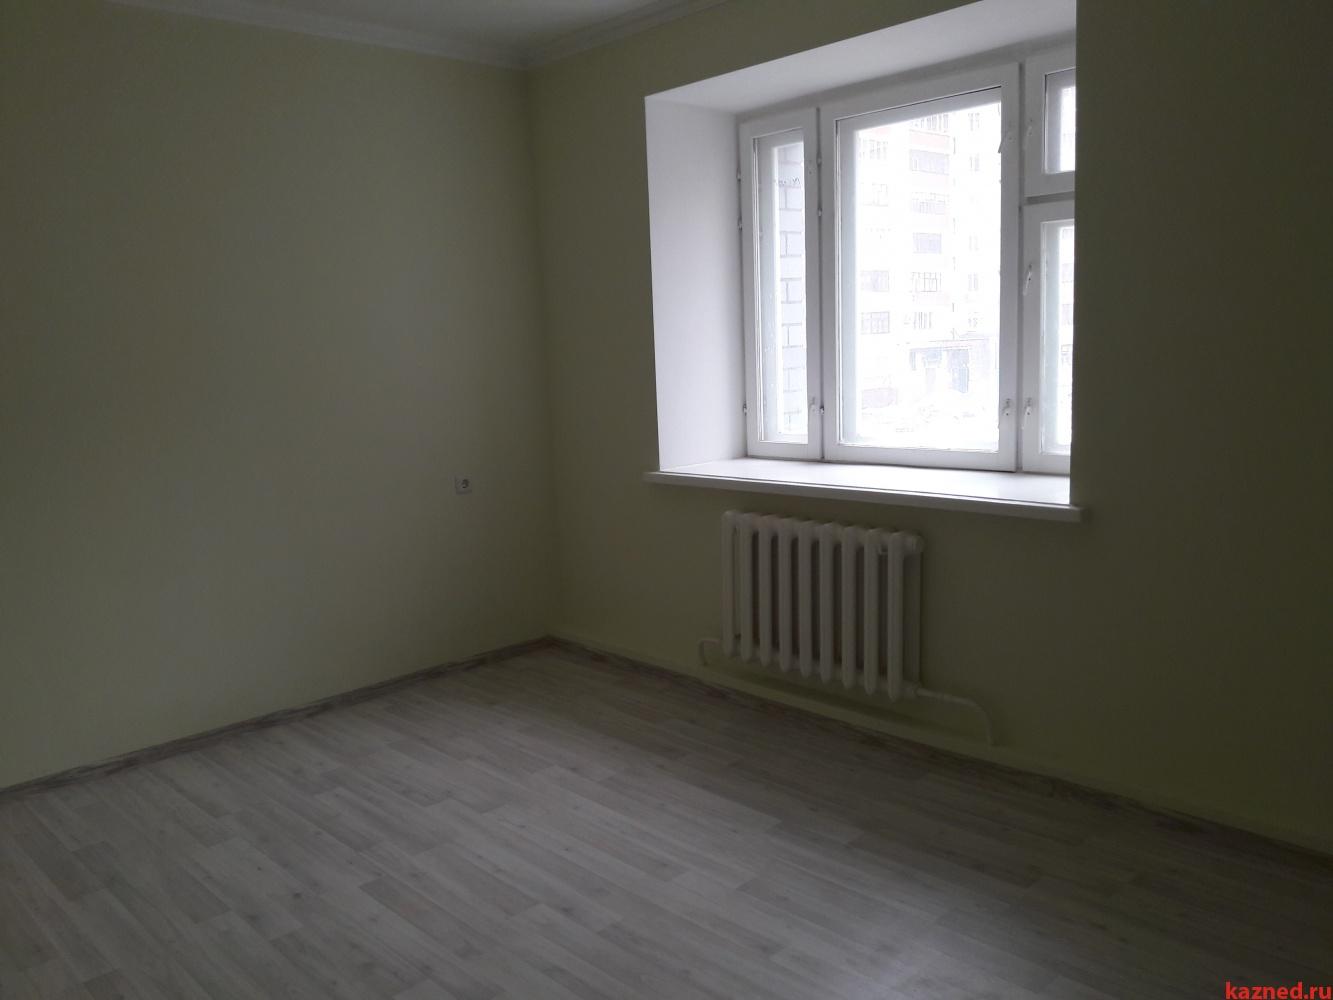 Продажа 3-к квартиры Карбышева,  67, 120 м2  (миниатюра №5)